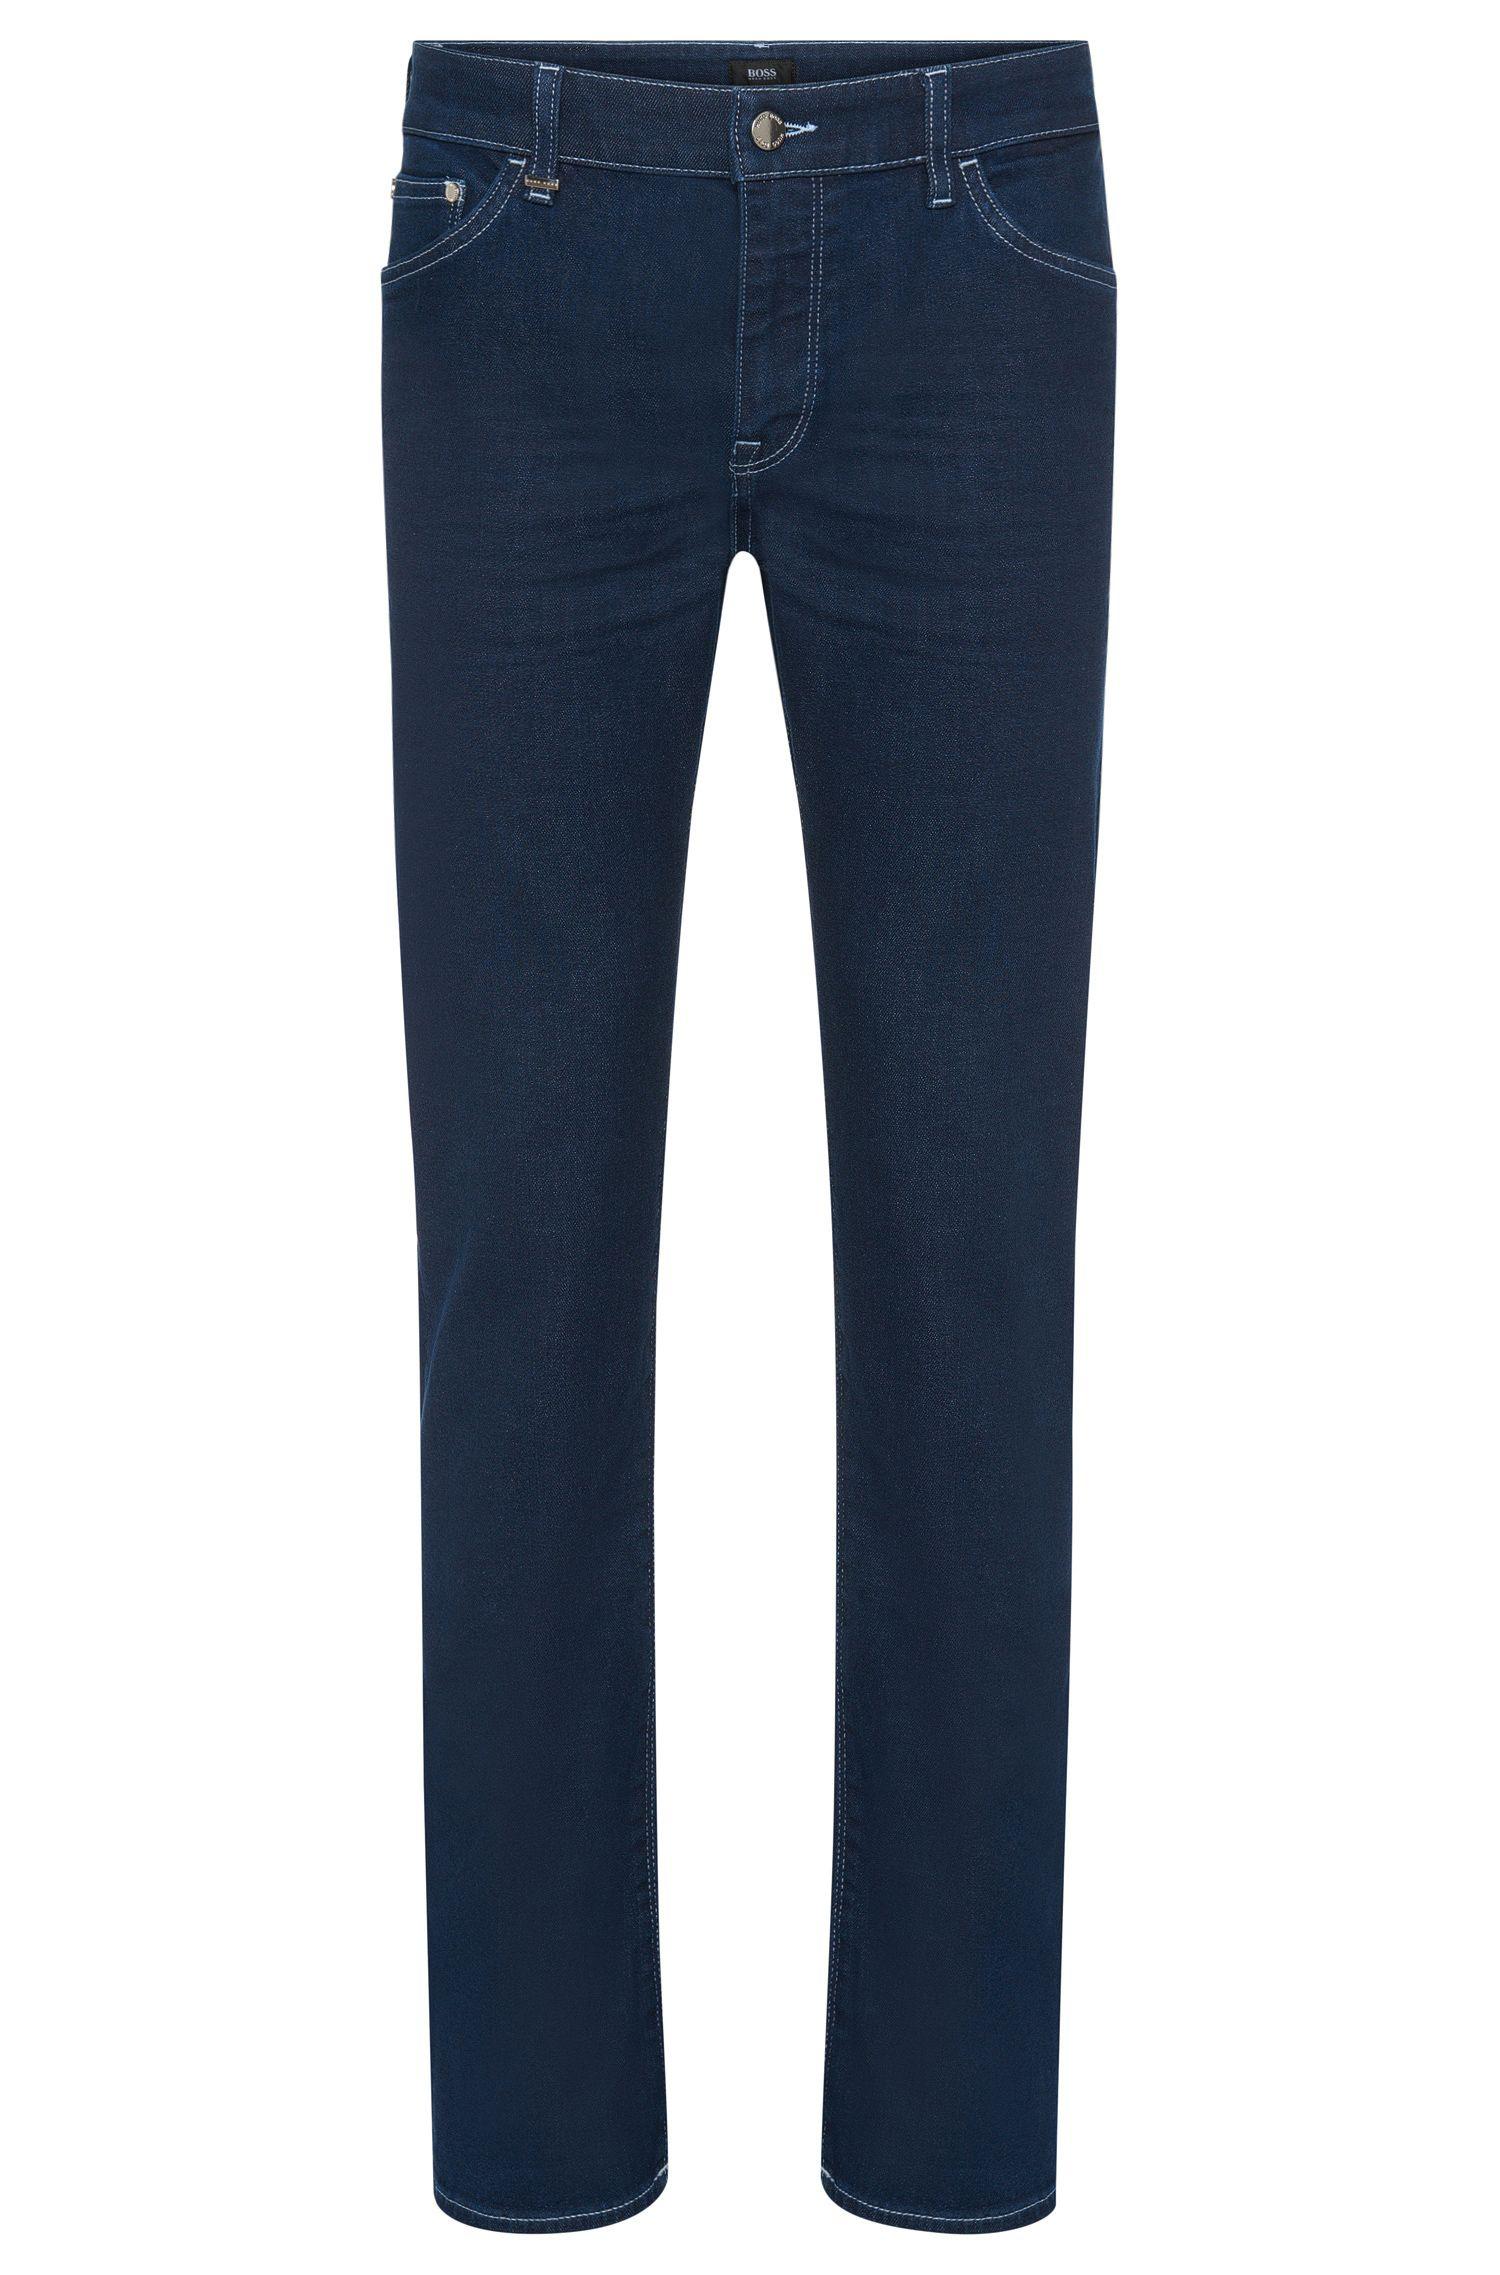 Regular-Fit Jeans aus elastischem Baumwoll-Mix in Rinsed-Optik: 'Maine3'